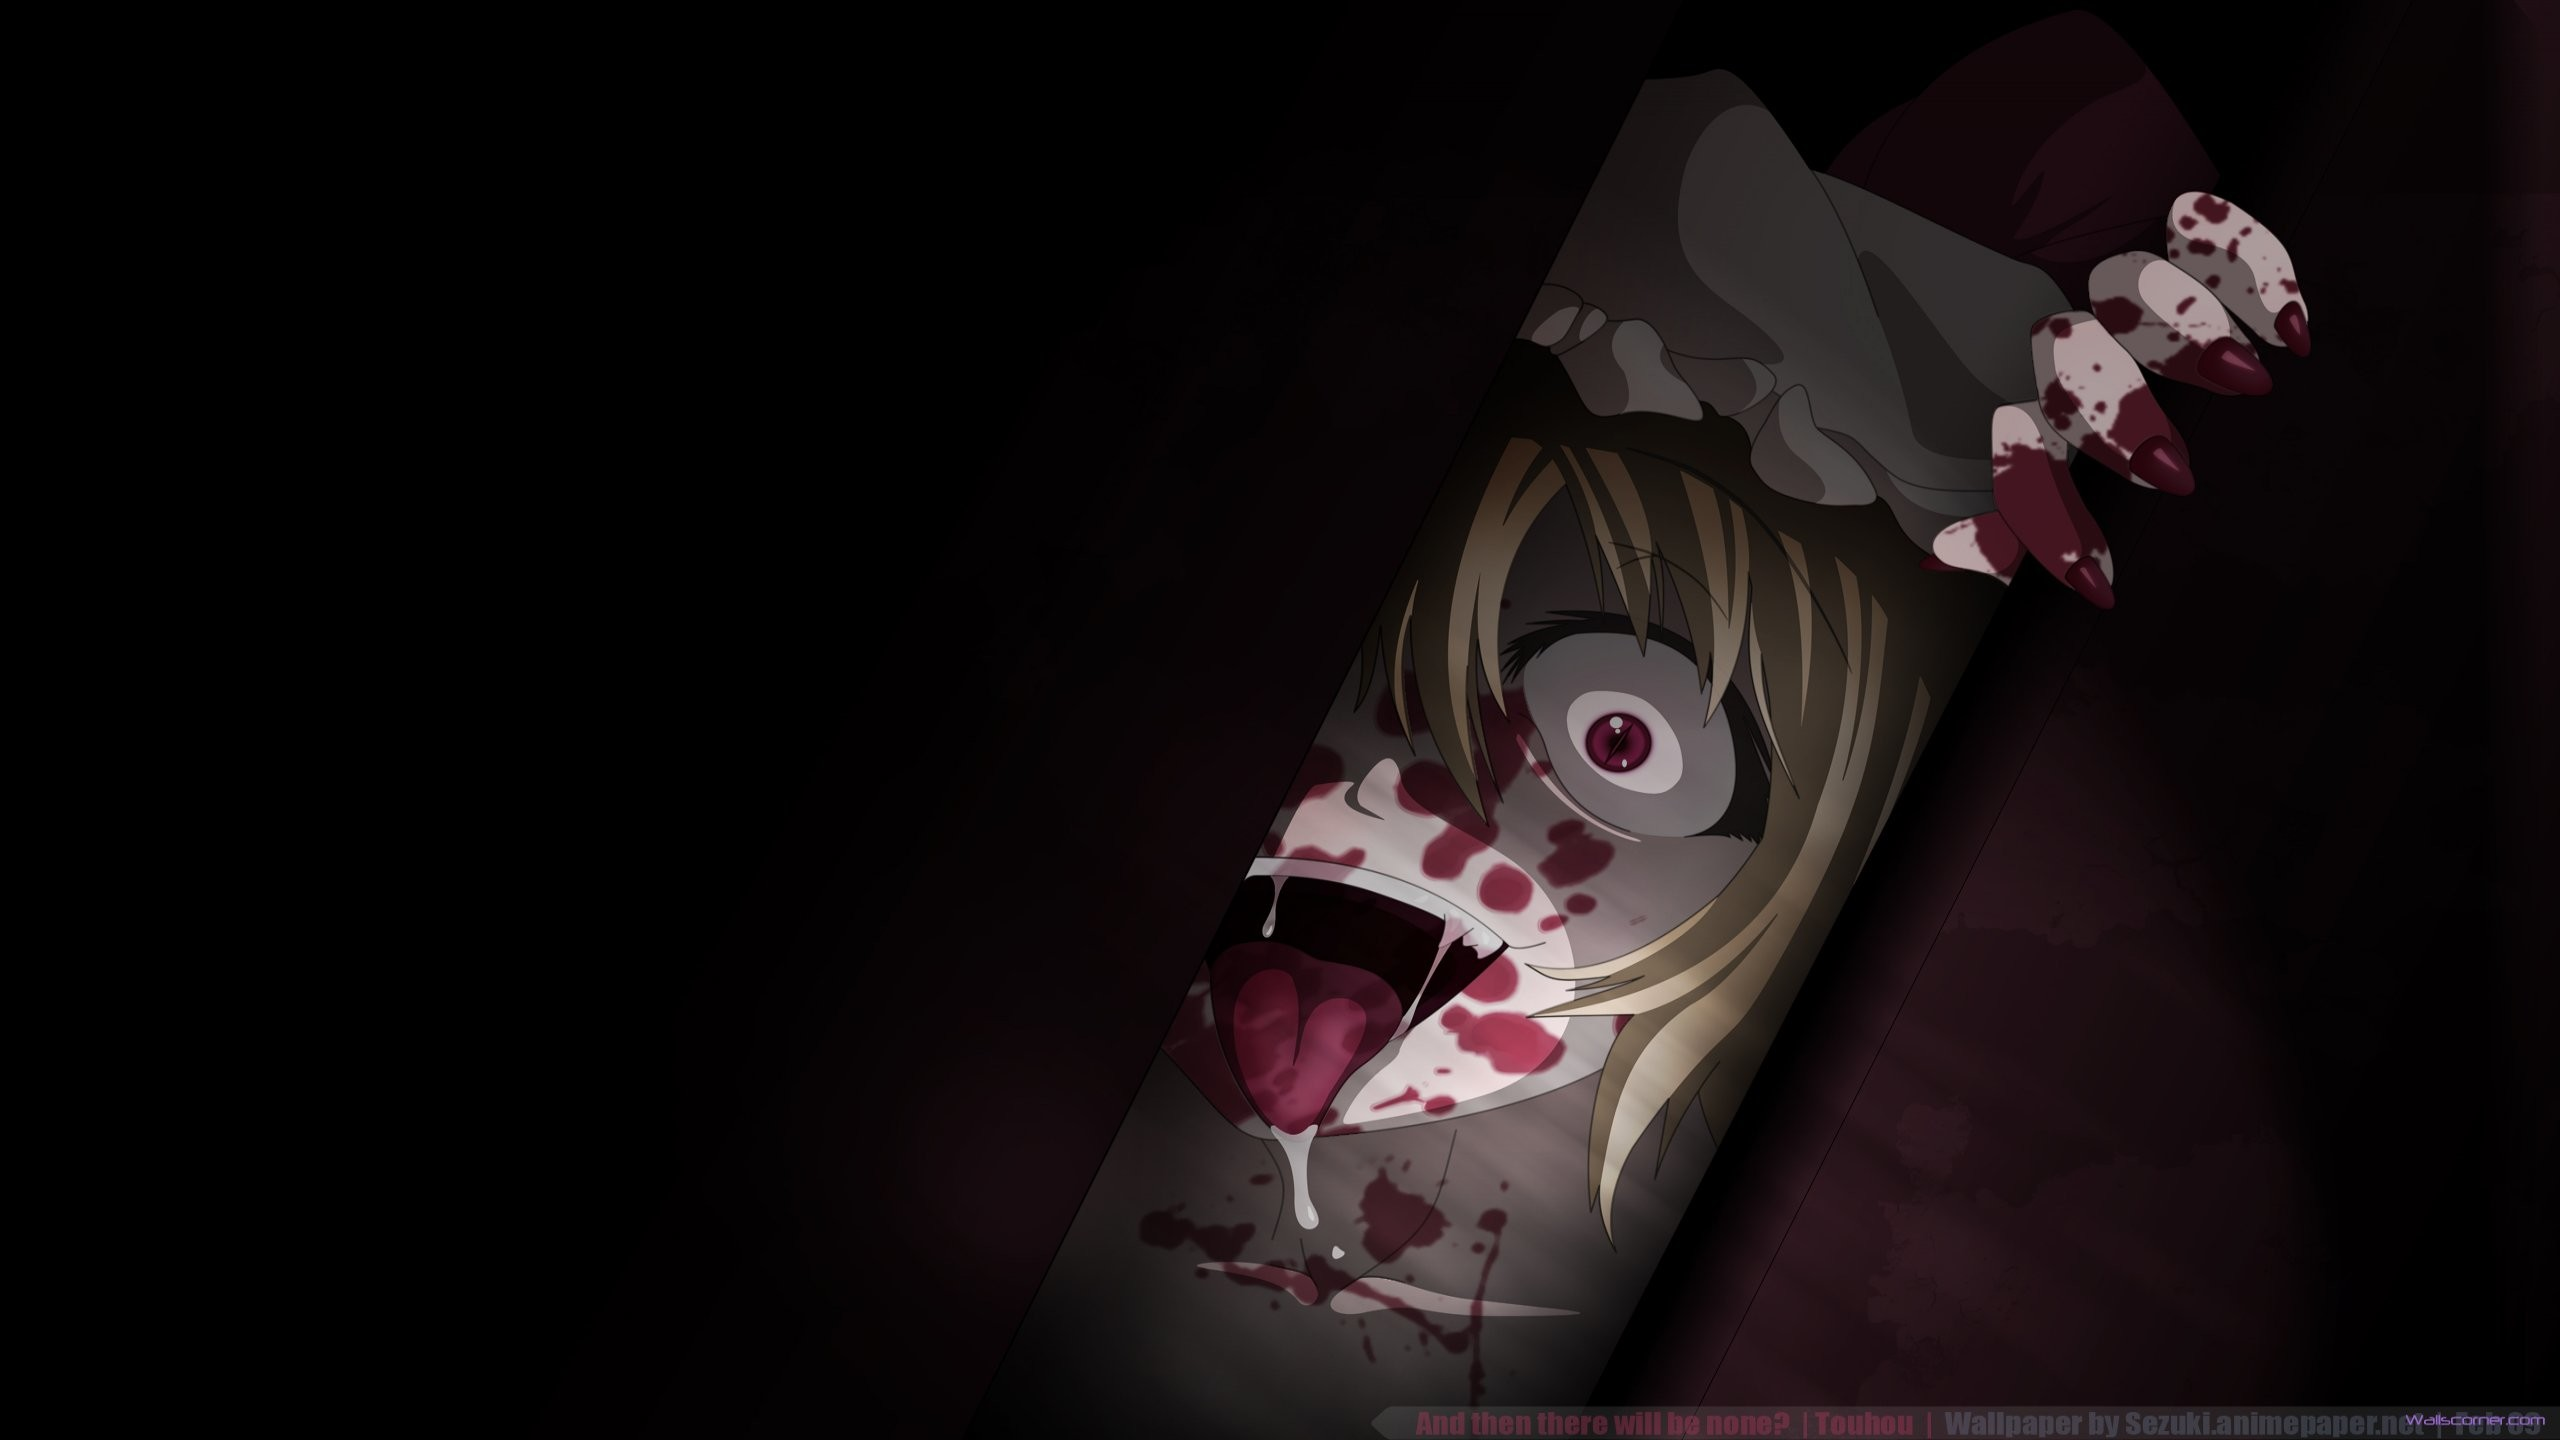 Res: 2560x1440, Anime Wallpaper 2048X1152 wallpaper